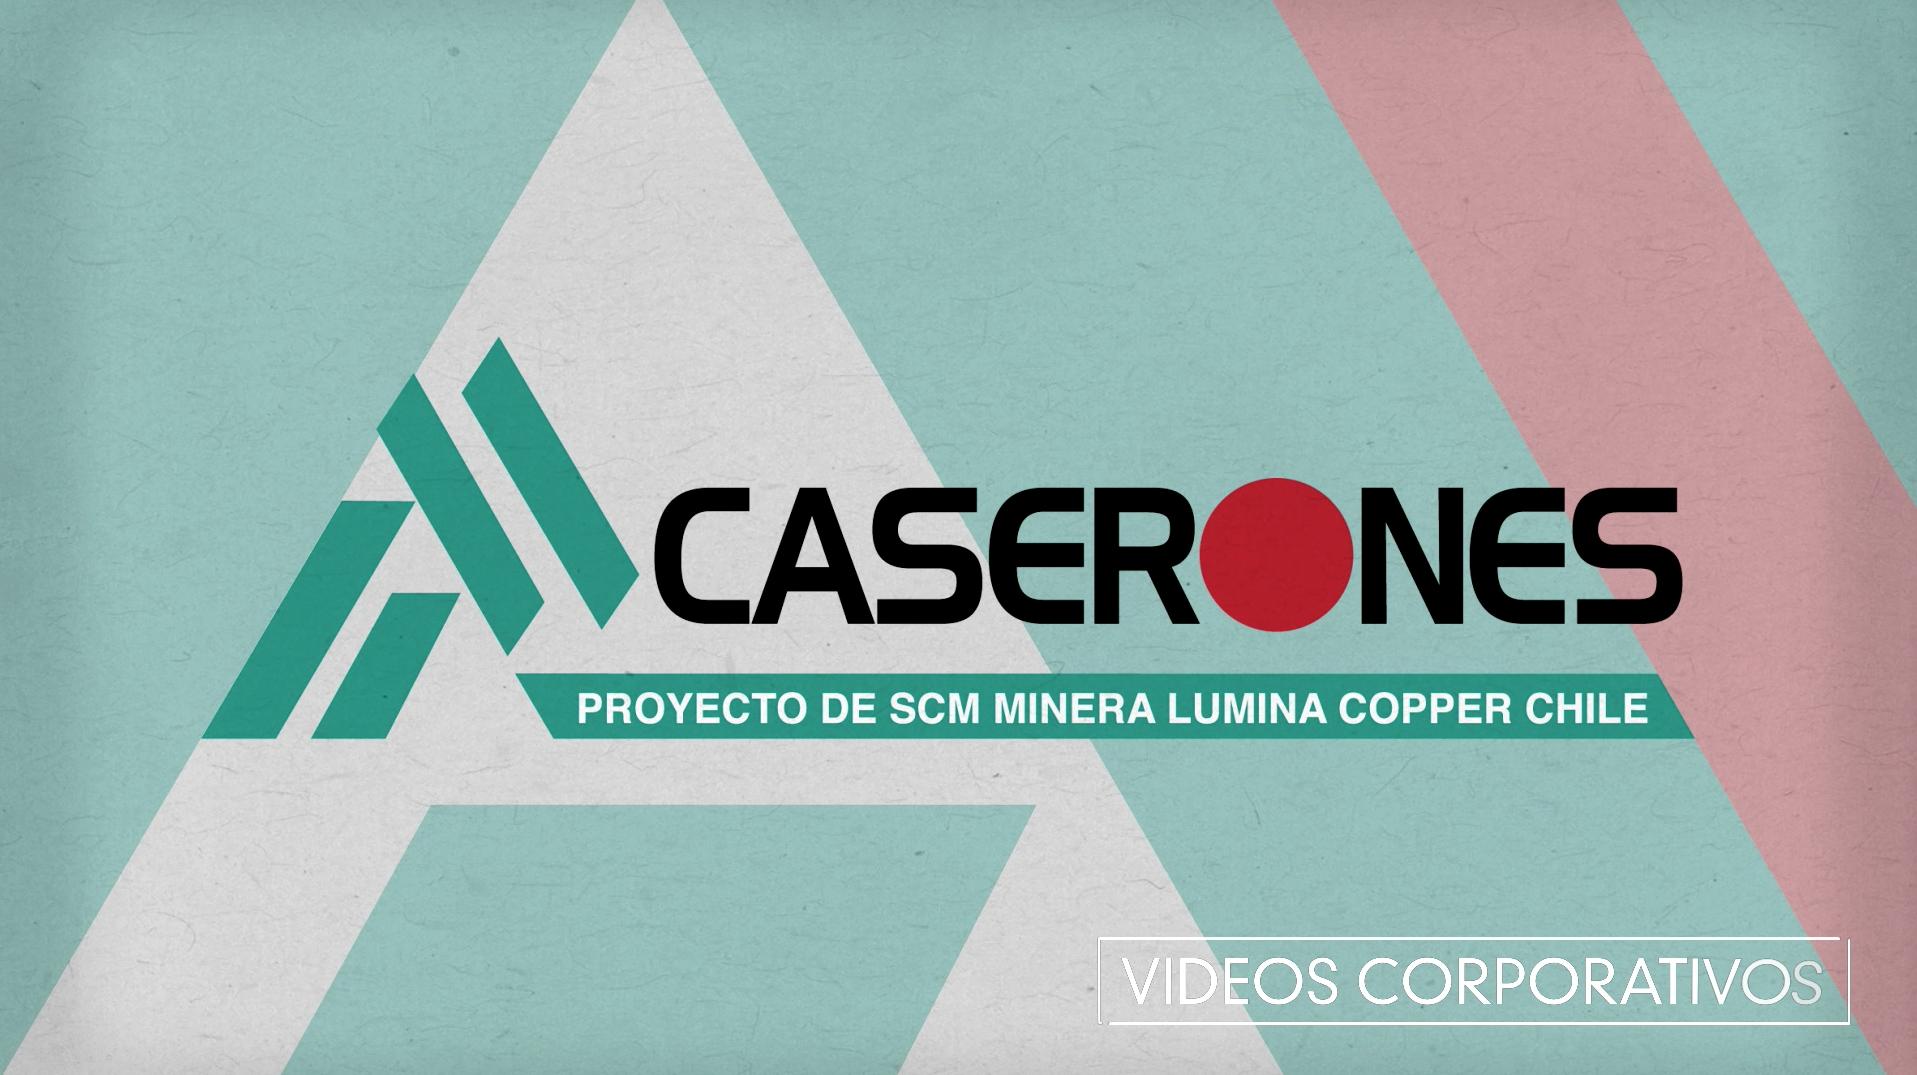 Minera Caserones